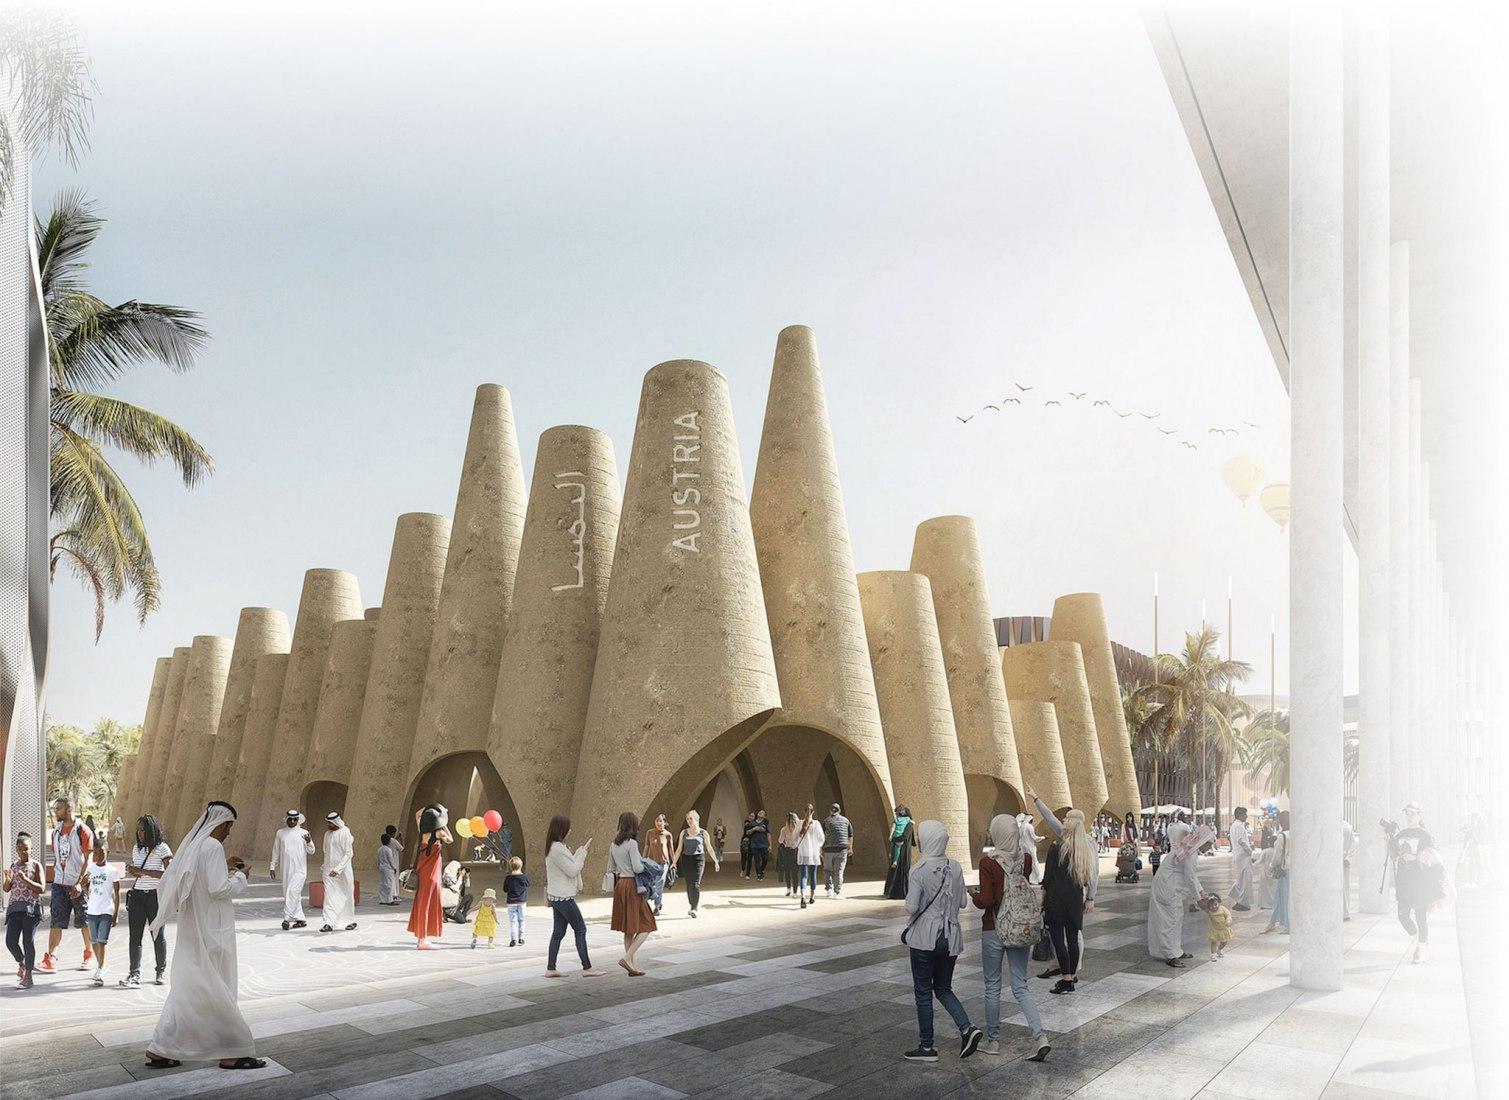 Rendering. Austrian Pavilion for Expo 2020 Dubai by querkraft architekten. Image © querkraft architekten - bagienski